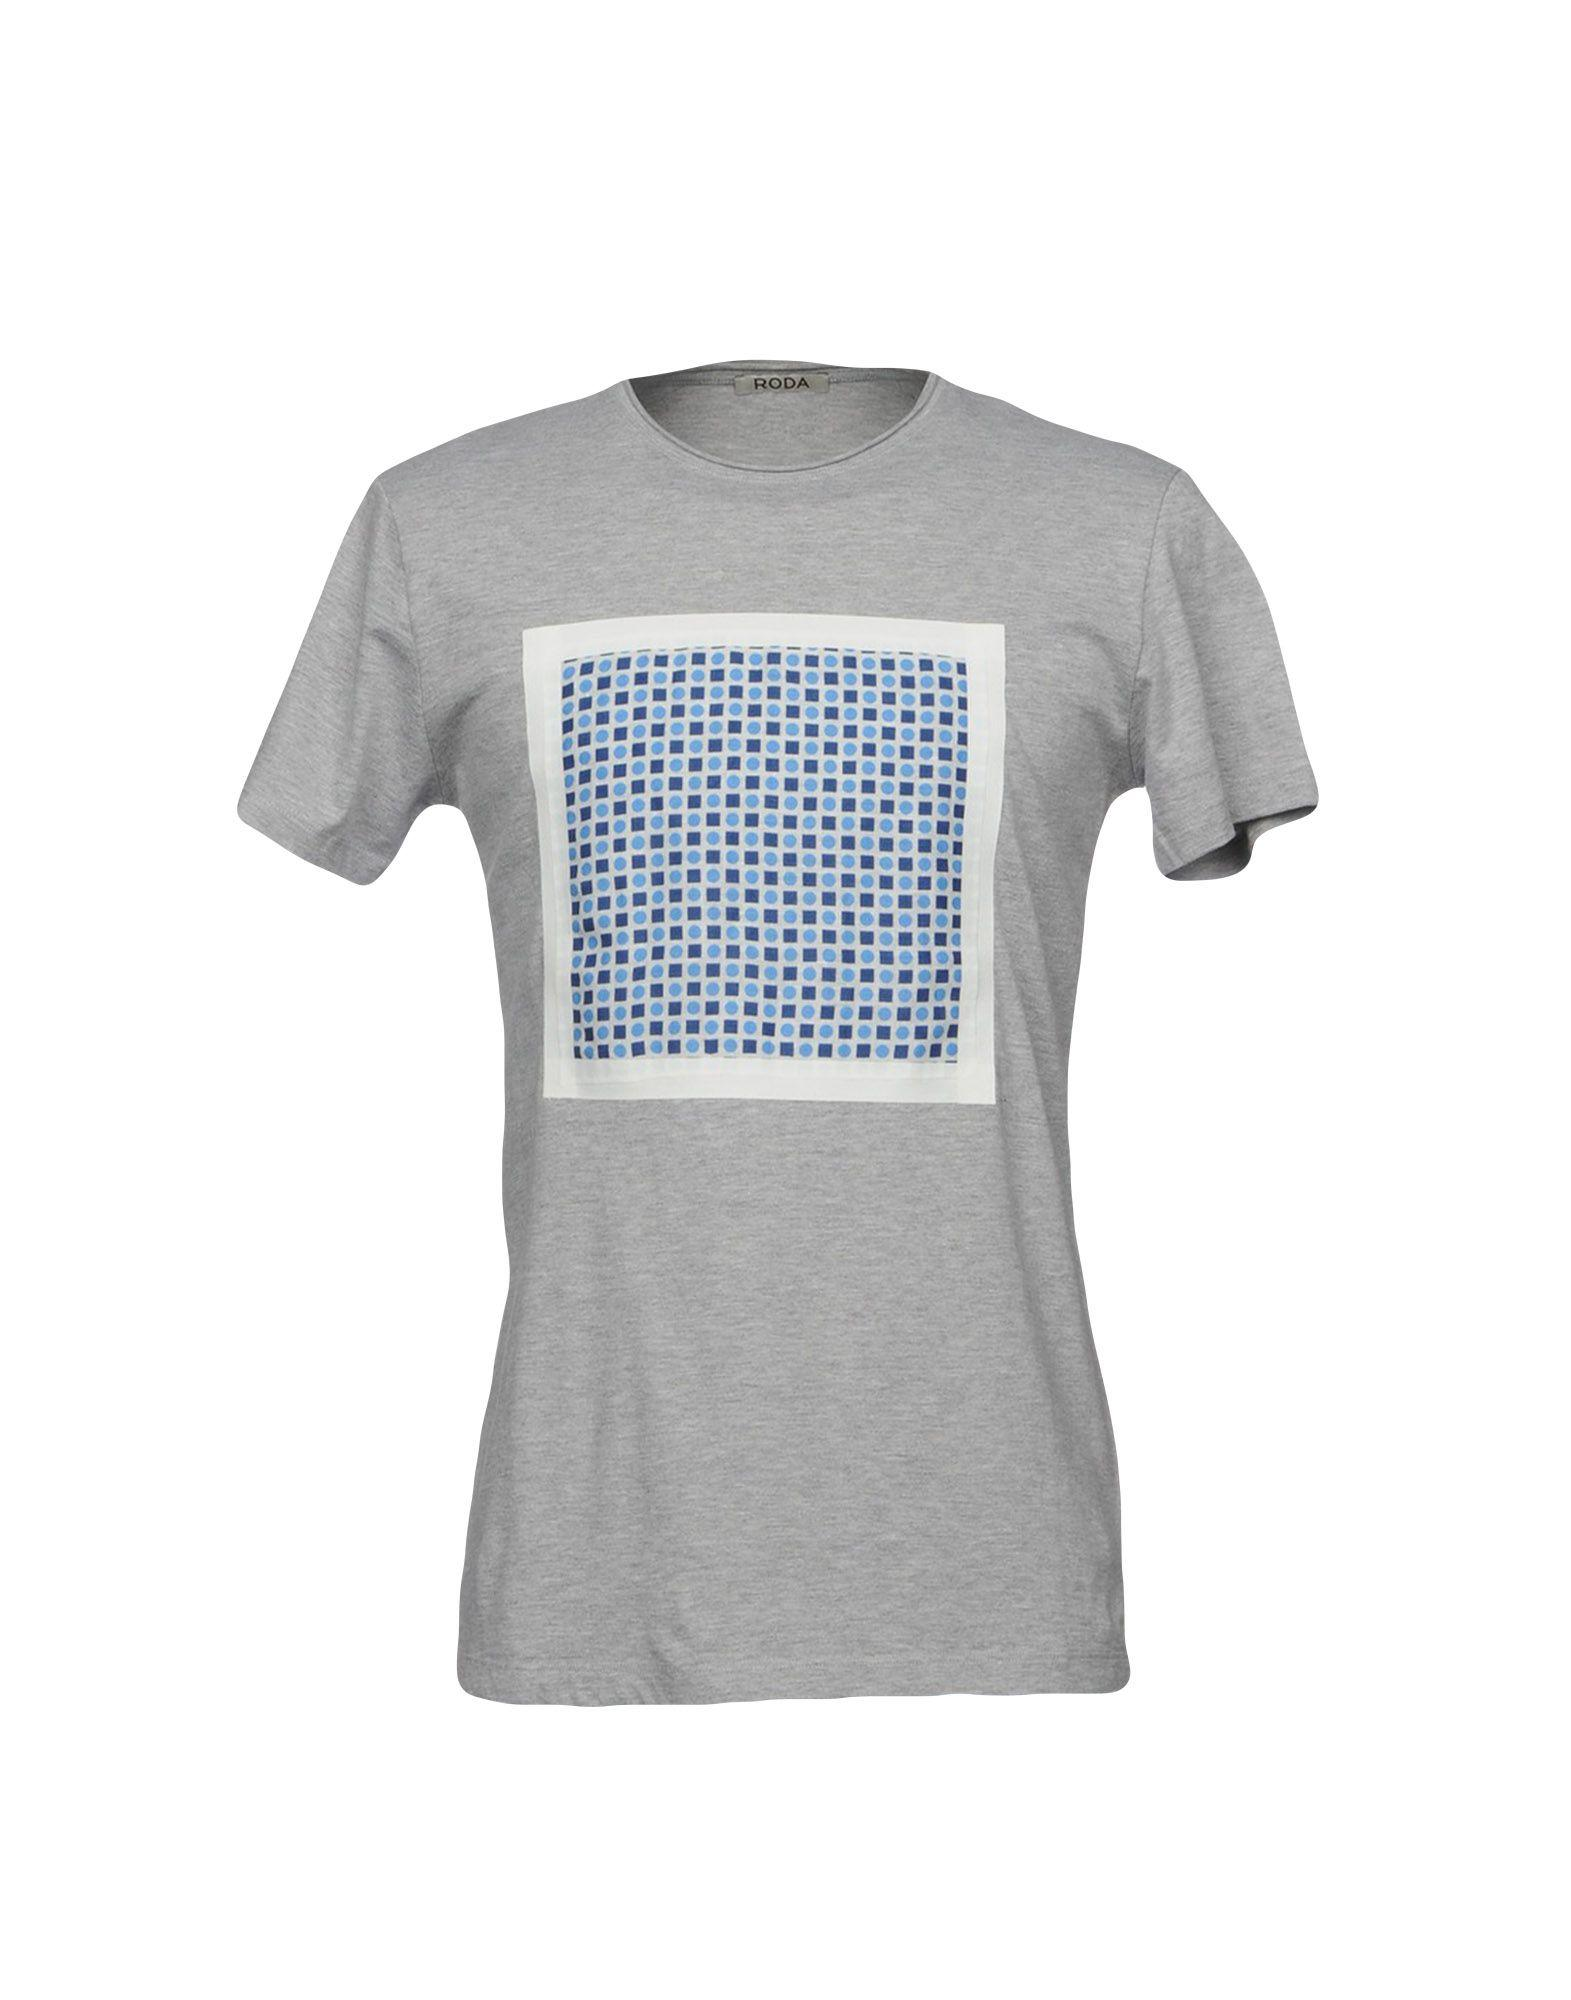 Roda T-Shirt In Grey